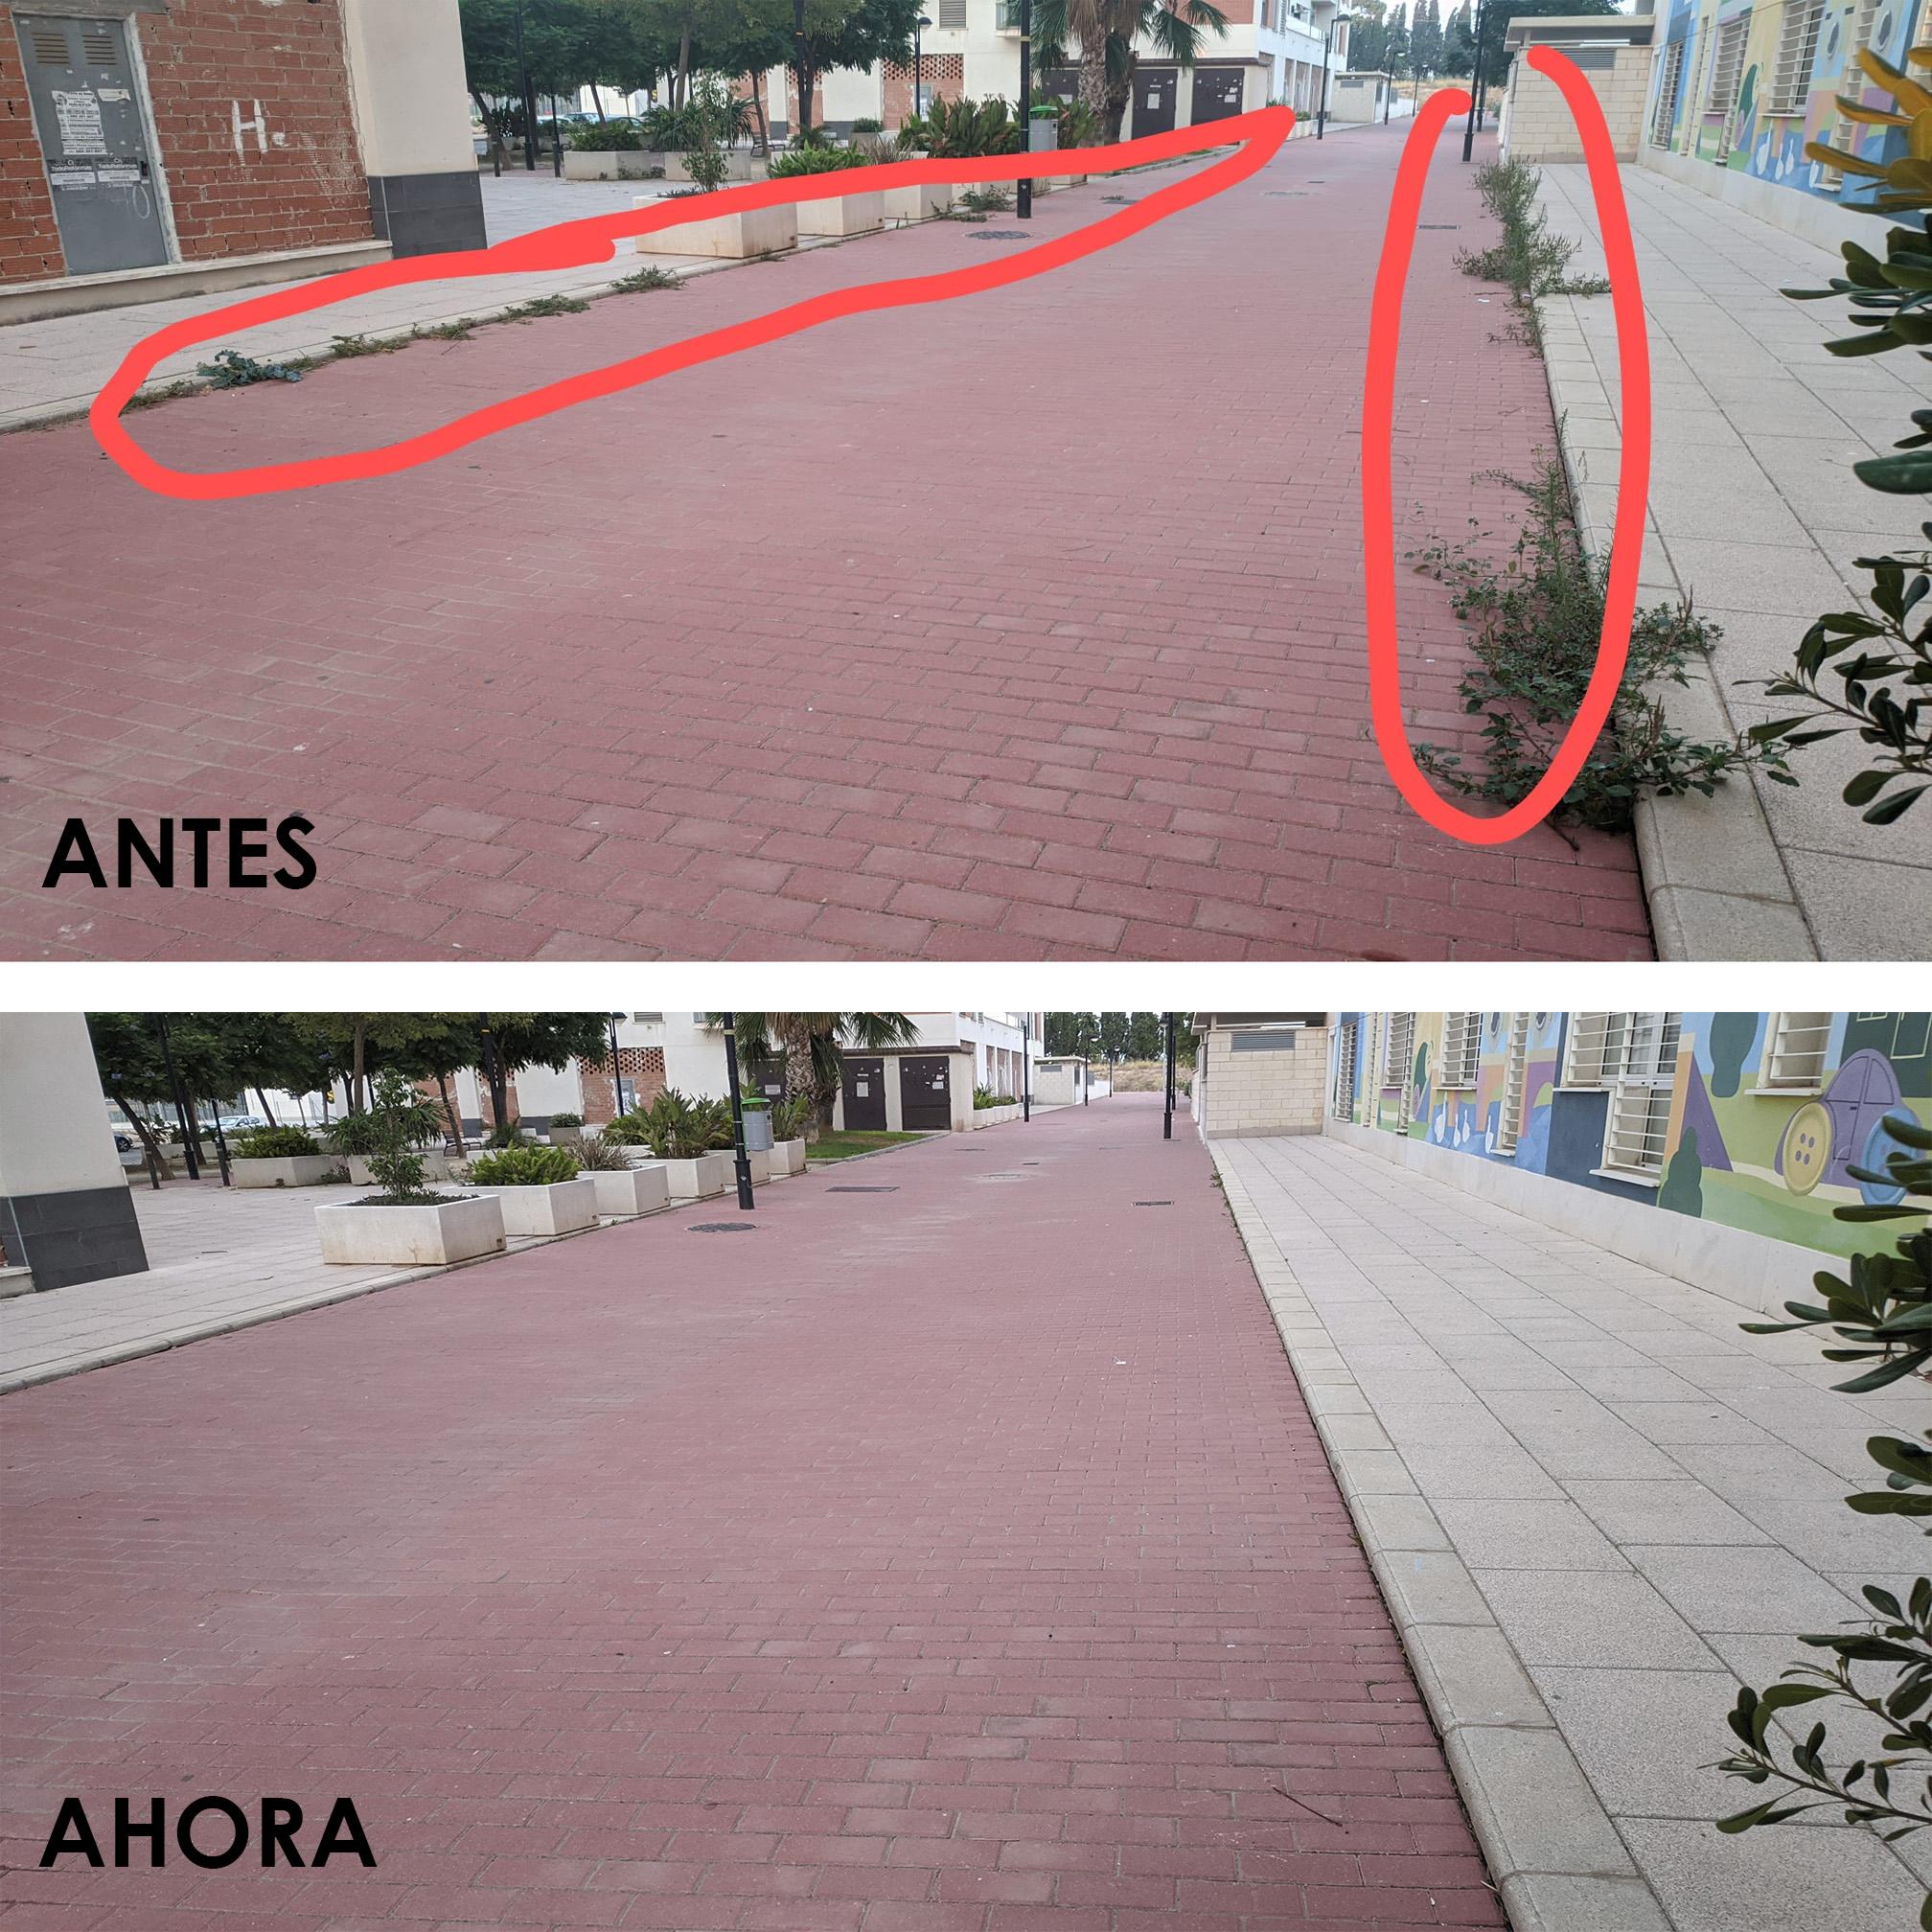 2020-10-08 Limpieza hierbas paseo peatonal Joven Futura junto a Futurines